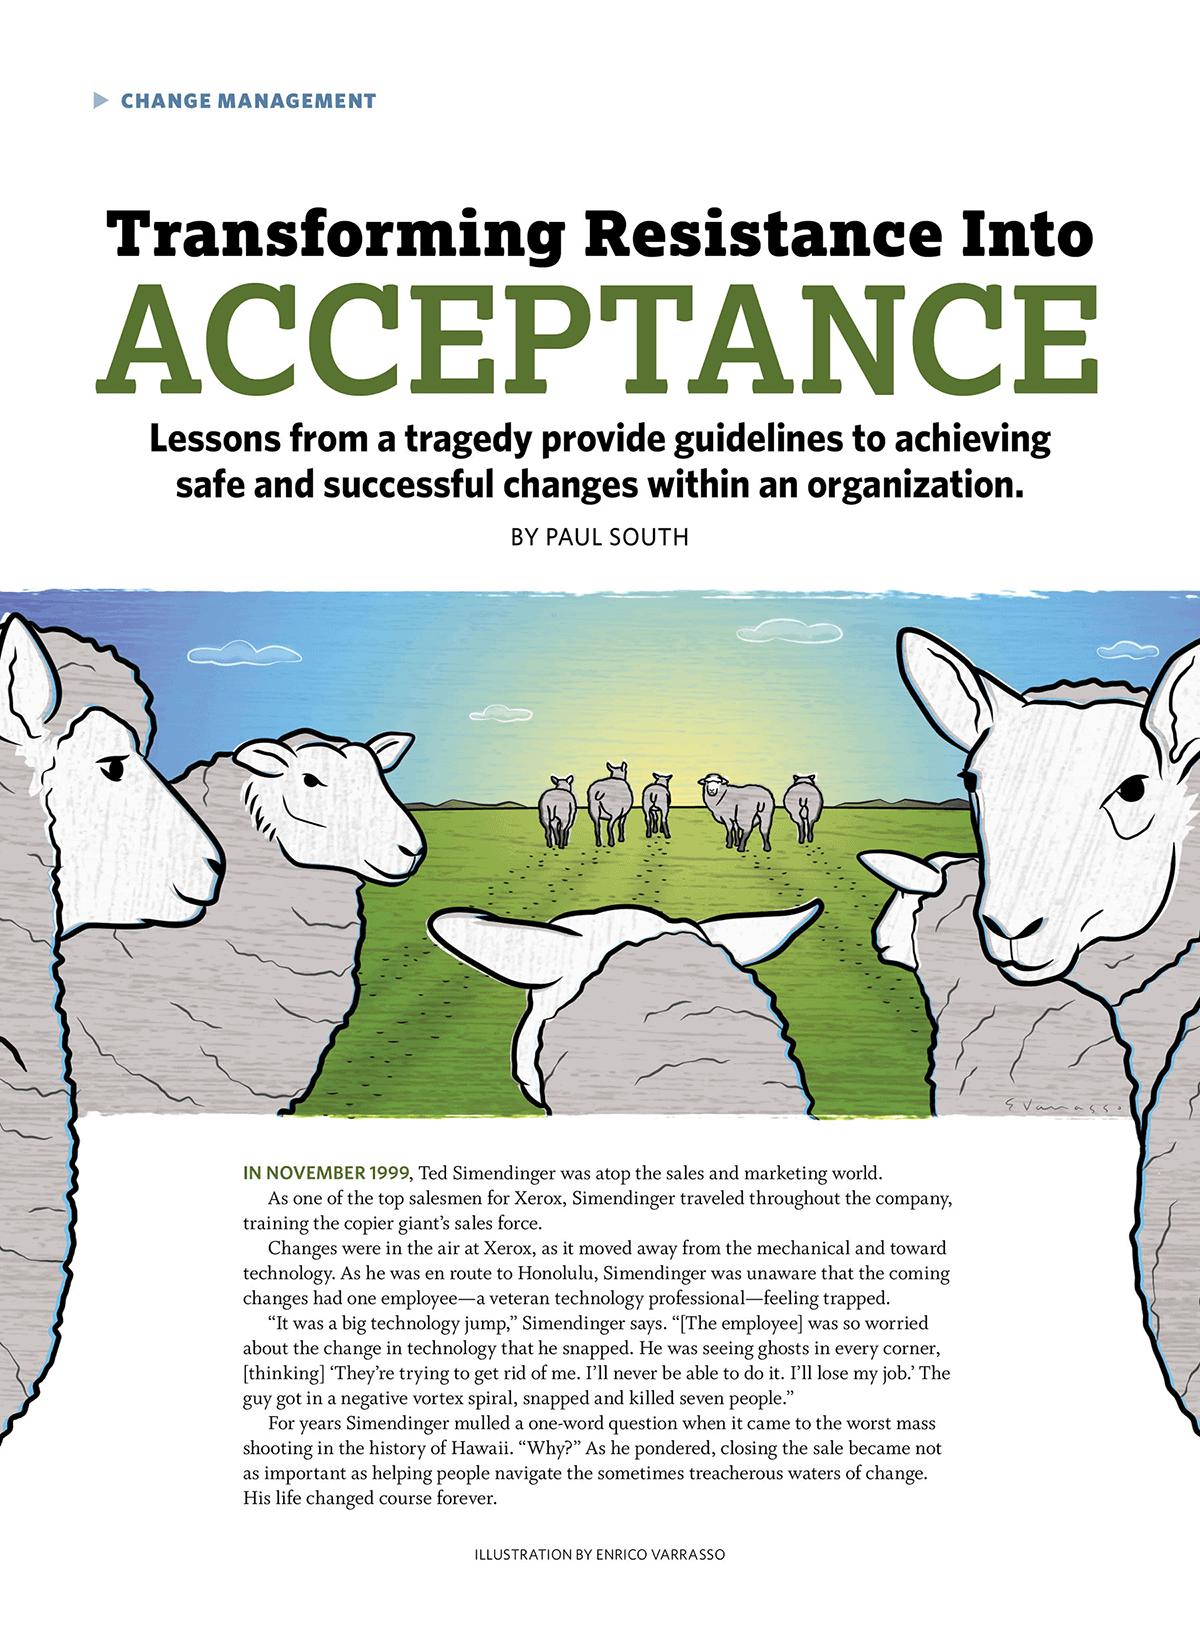 Transforming Resistance into Acceptance